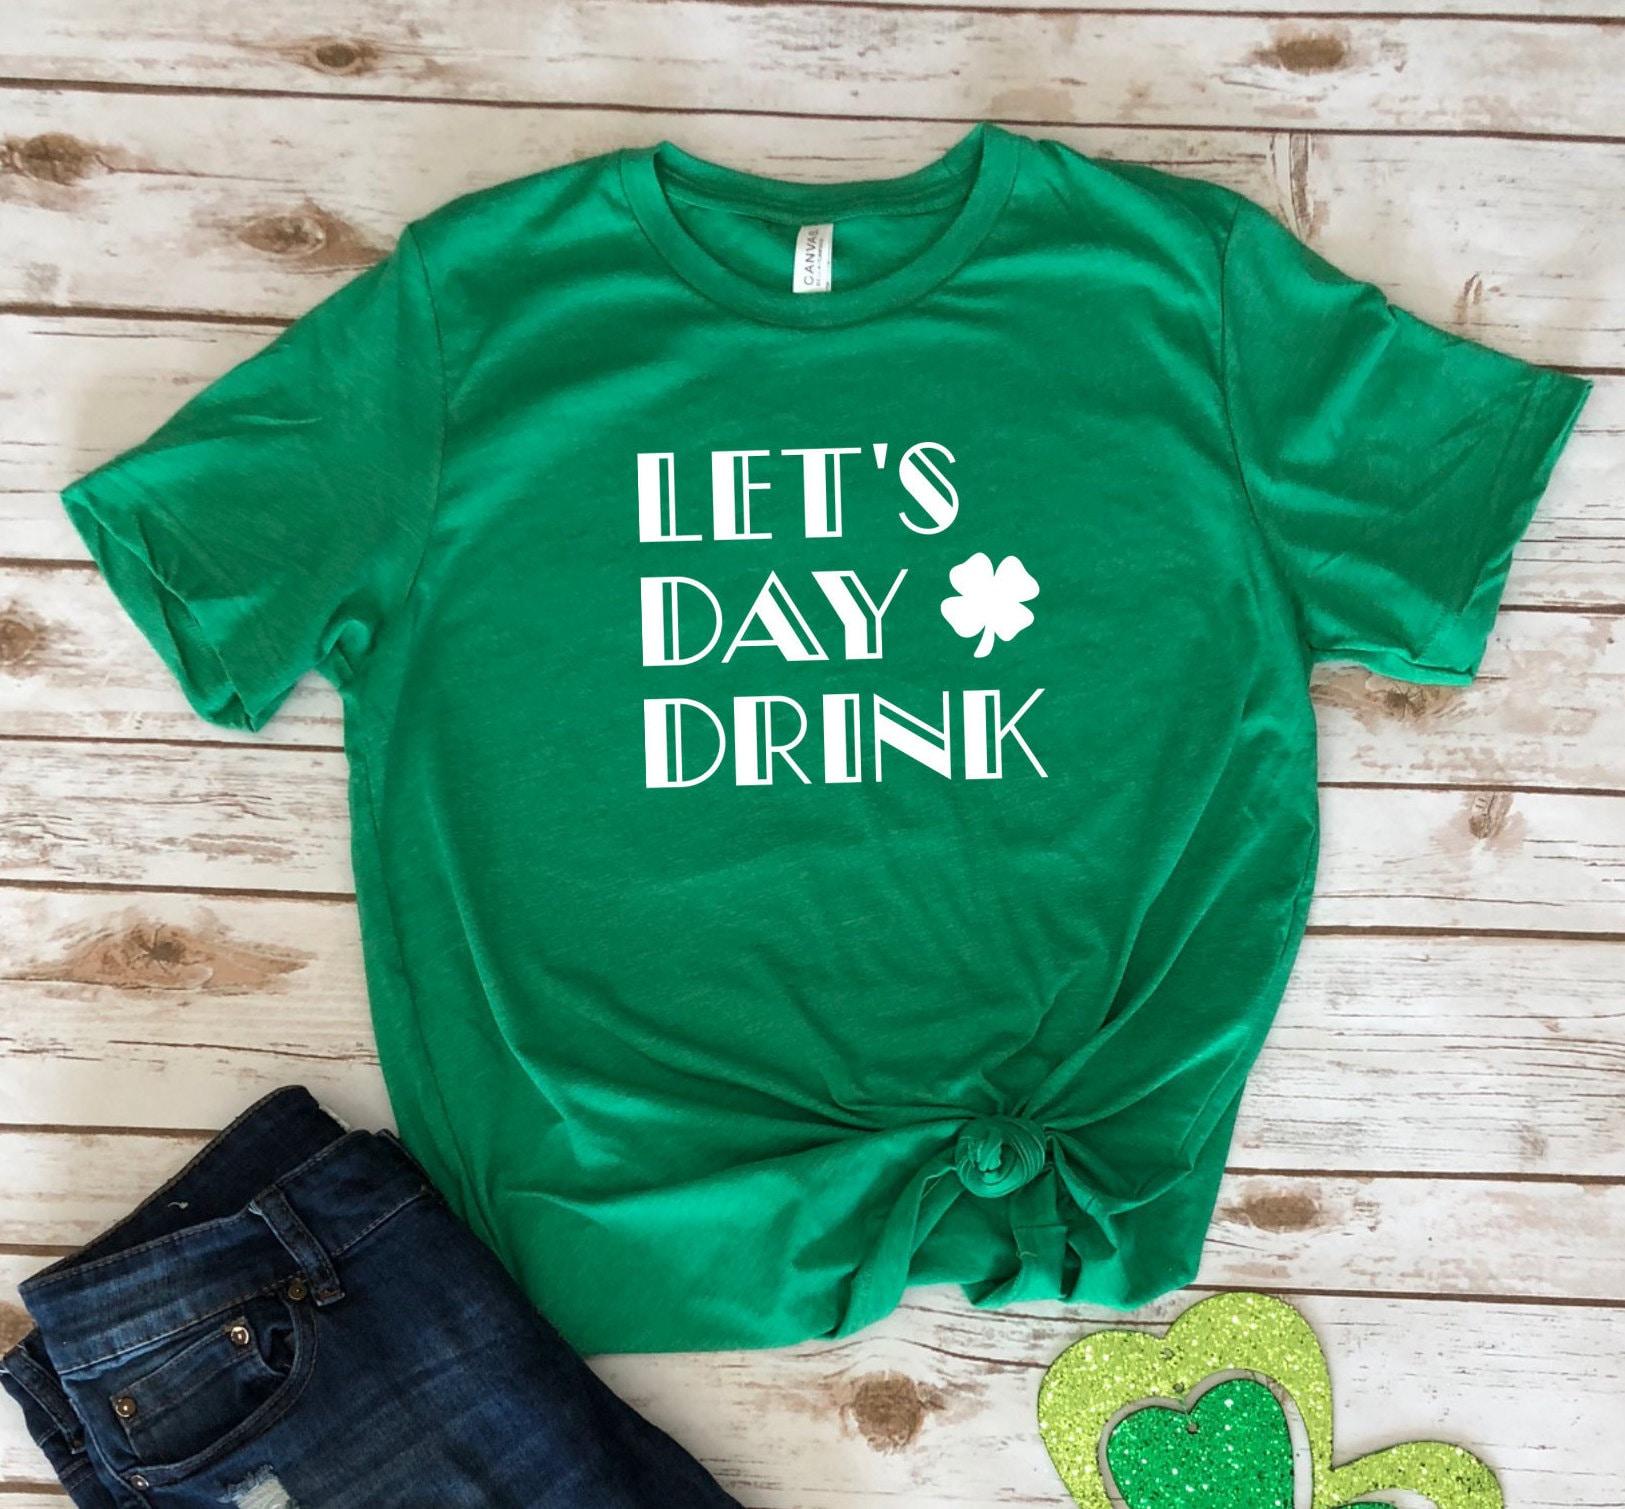 10b04df8 St Patricks Day Shirt Women, St Pattys Day shirt women, Funny St Patricks  Day Shirt Women, Womens St Patricks Day Shirt, Funny Shirt Women